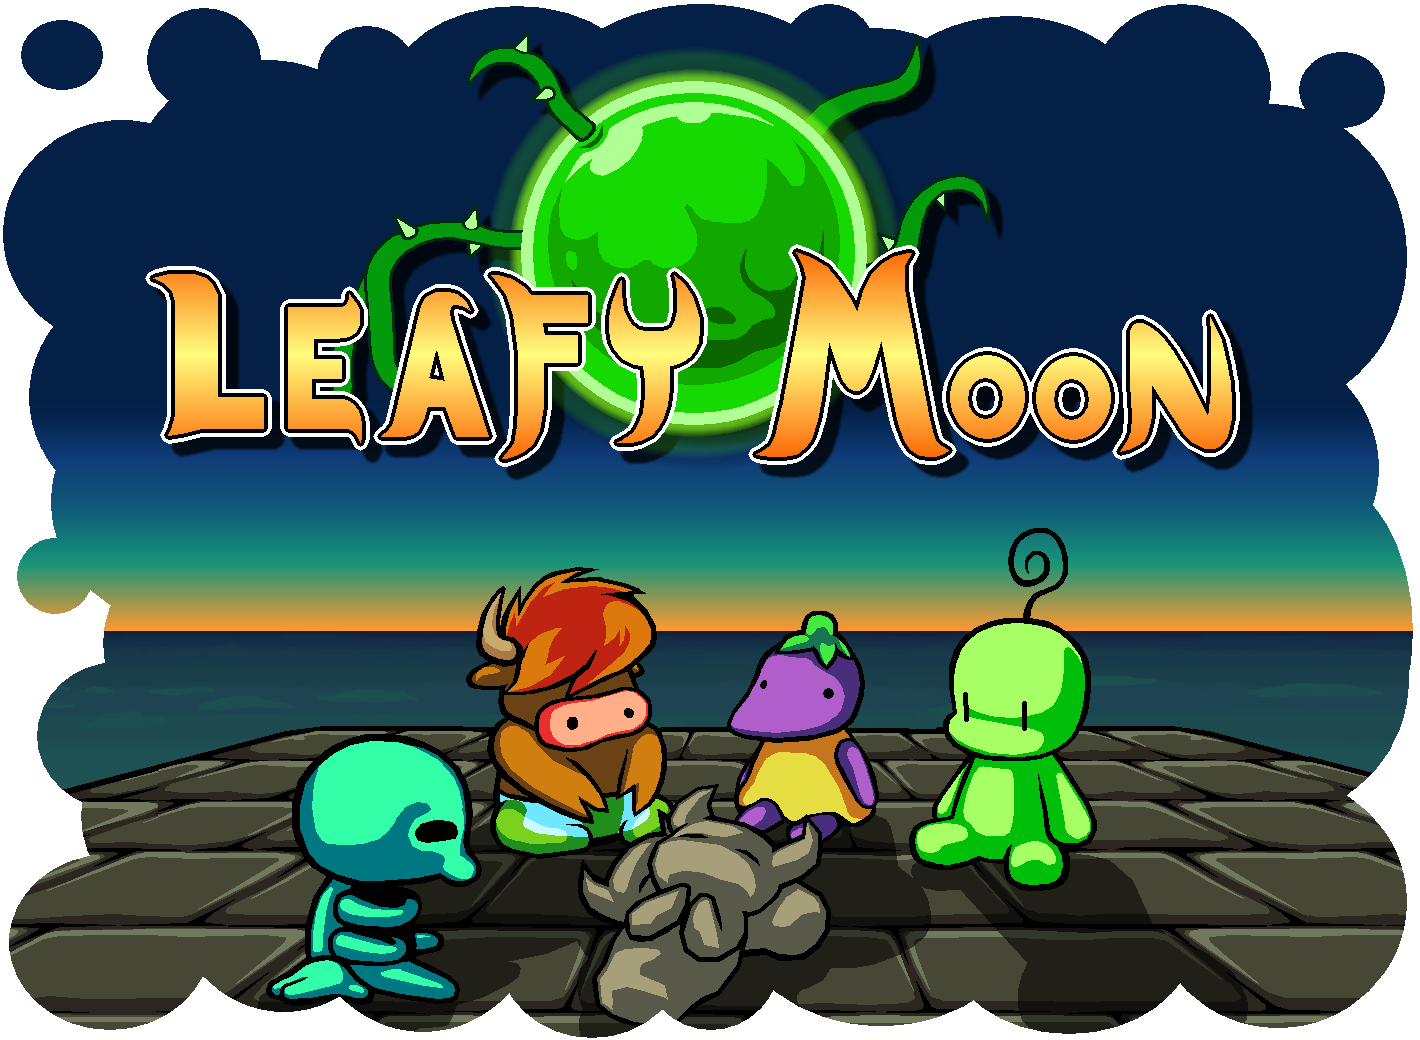 Leafy Moon